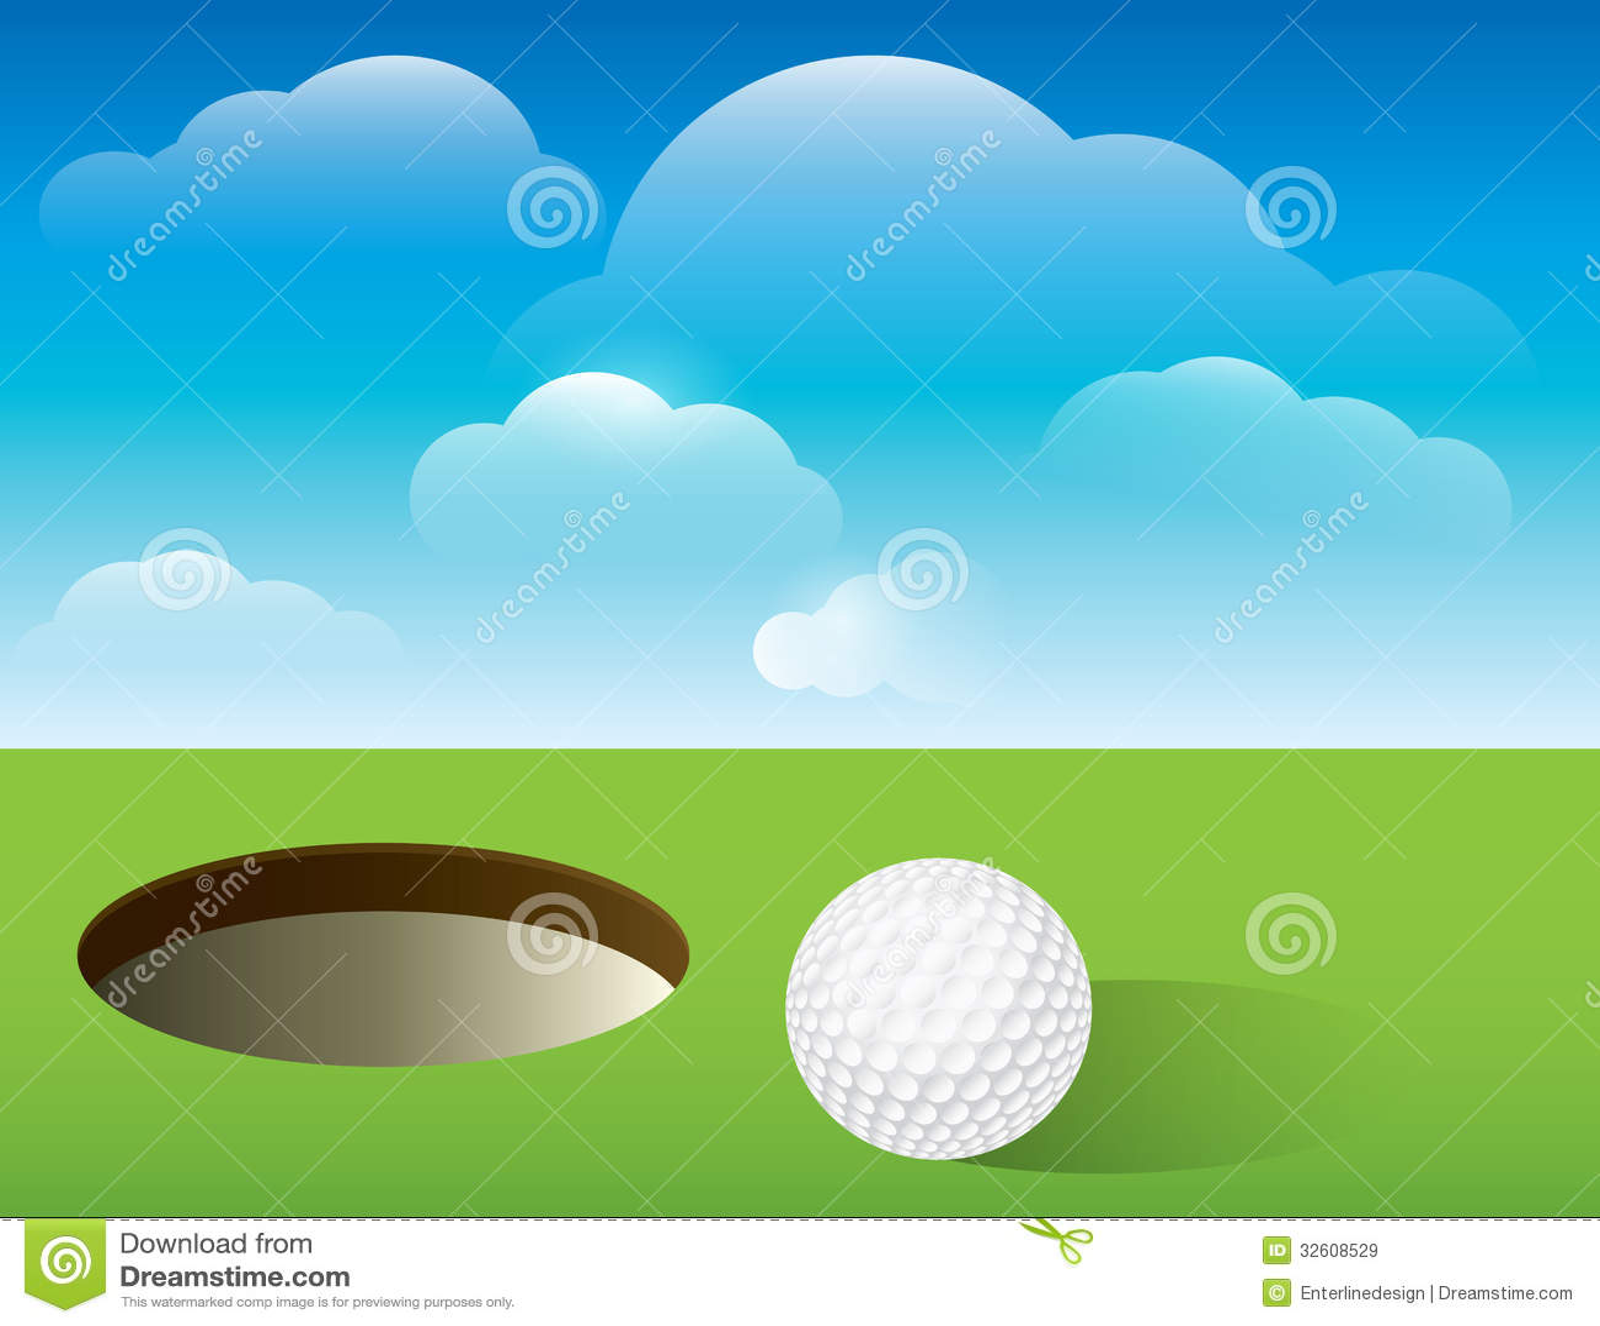 Invitation Golf Tournament with good invitation example